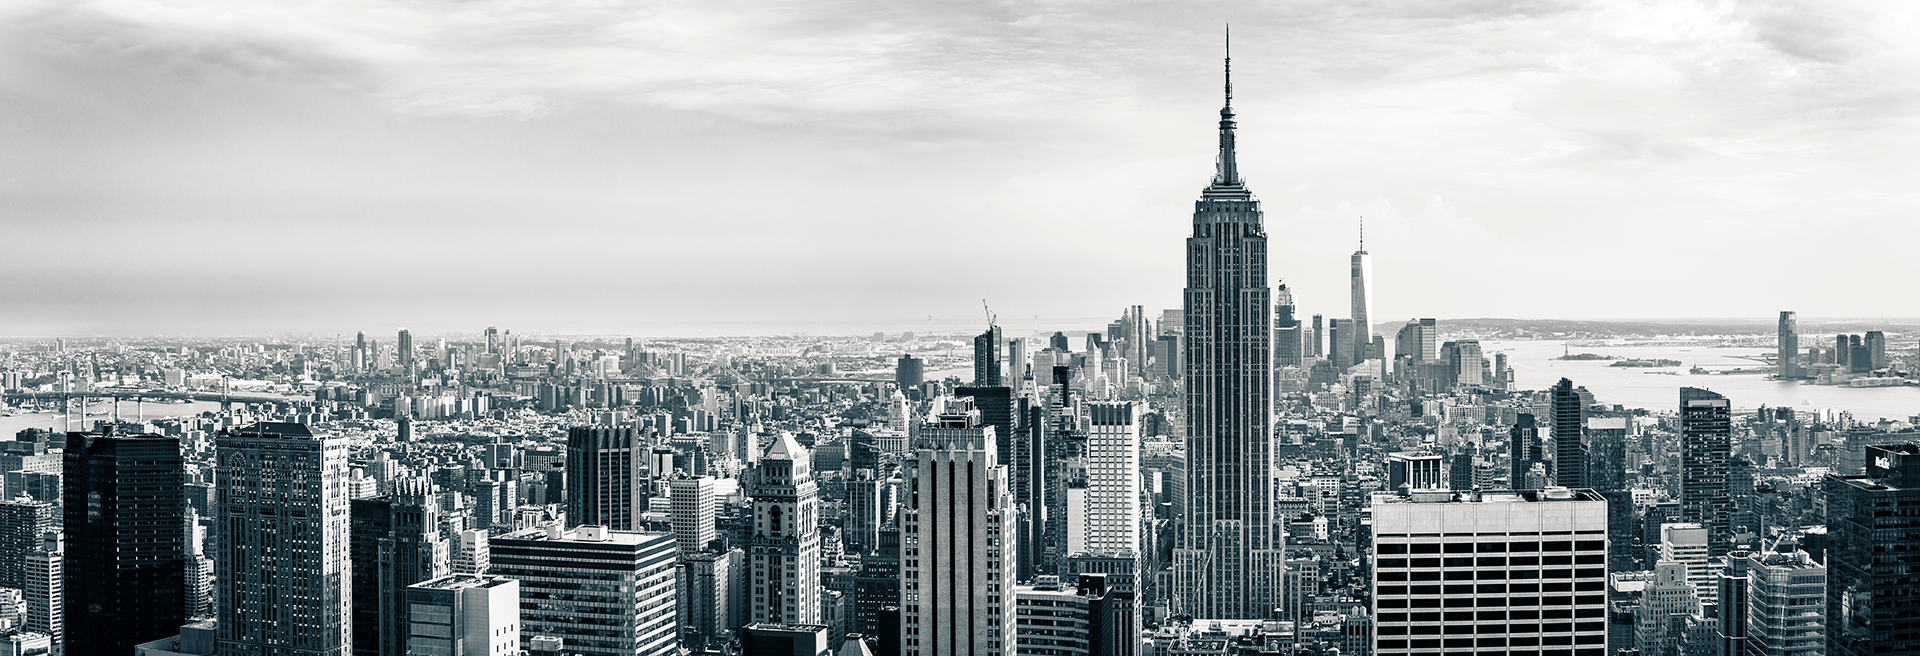 New York-1-skyline